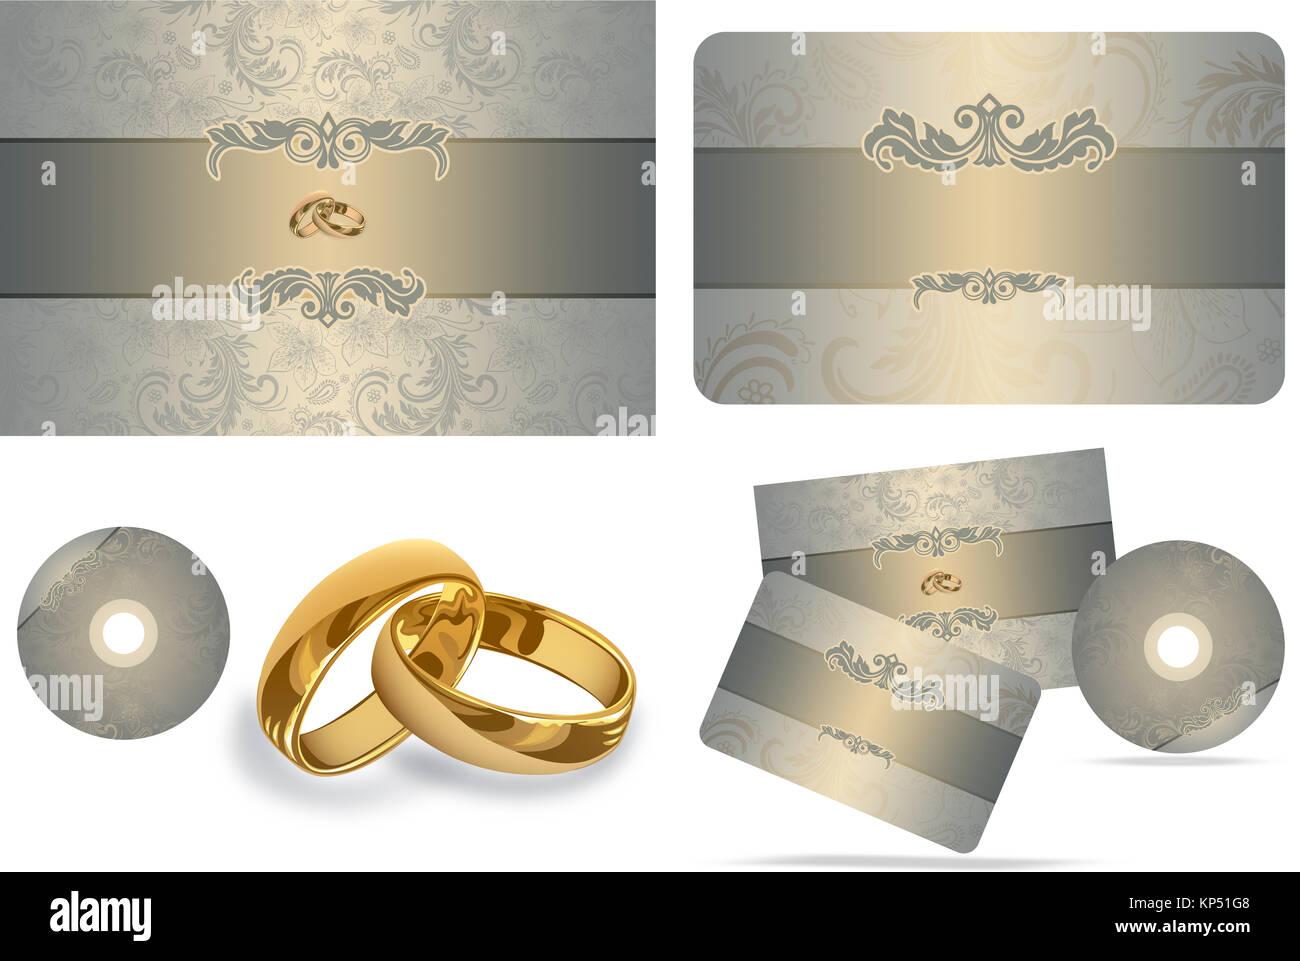 Wedding templates of invitation card gift card cd and gold rings wedding templates of invitation card gift card cd and gold rings on white background stopboris Images